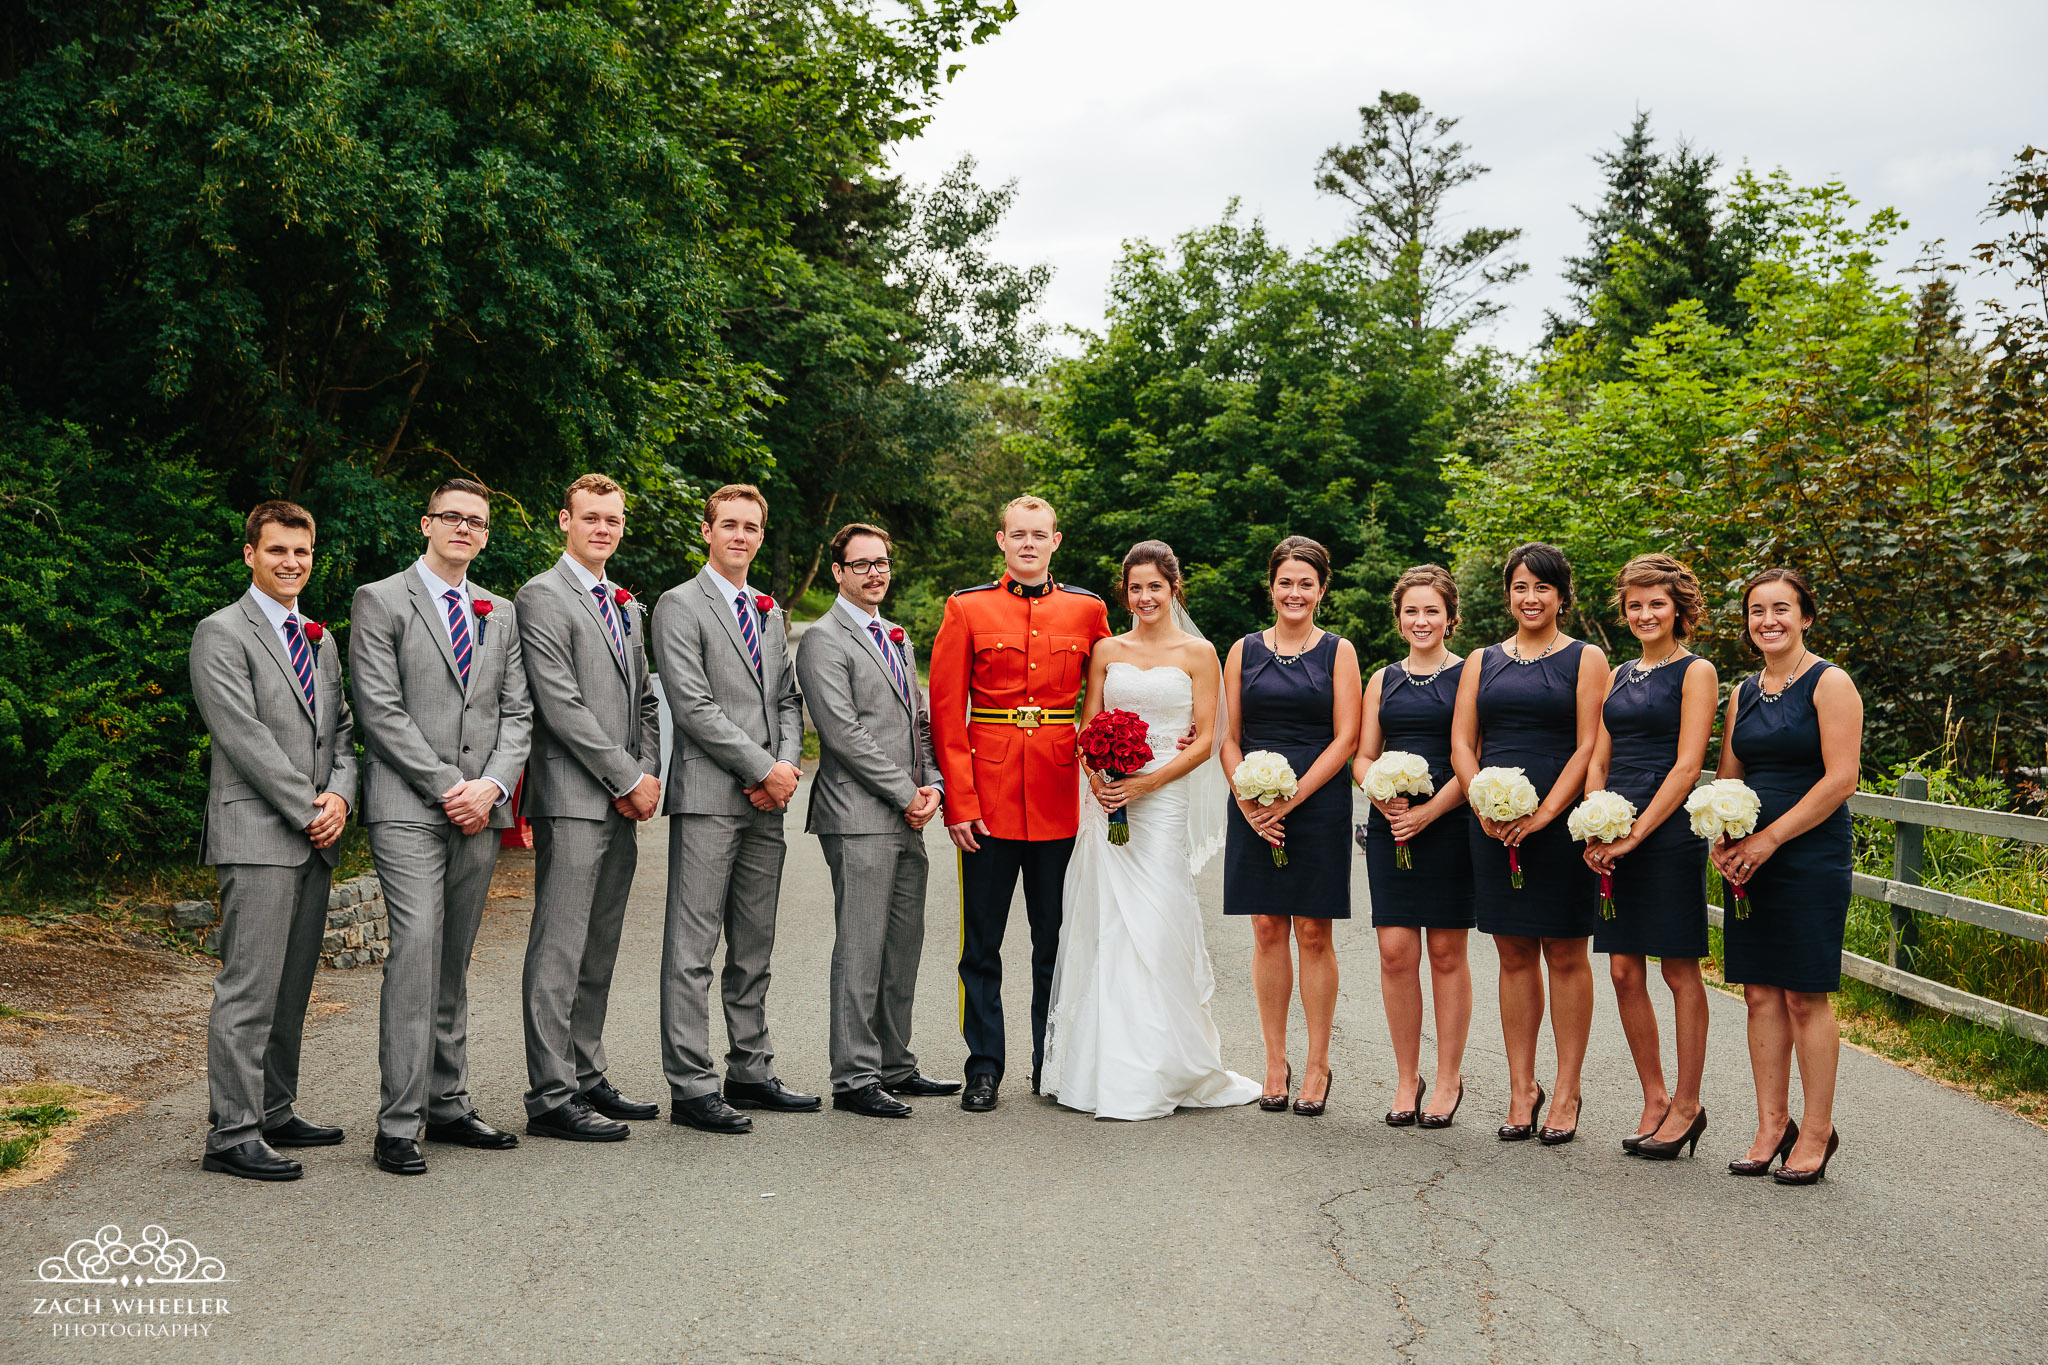 Laura-Benj-StJohns-Wedding-70